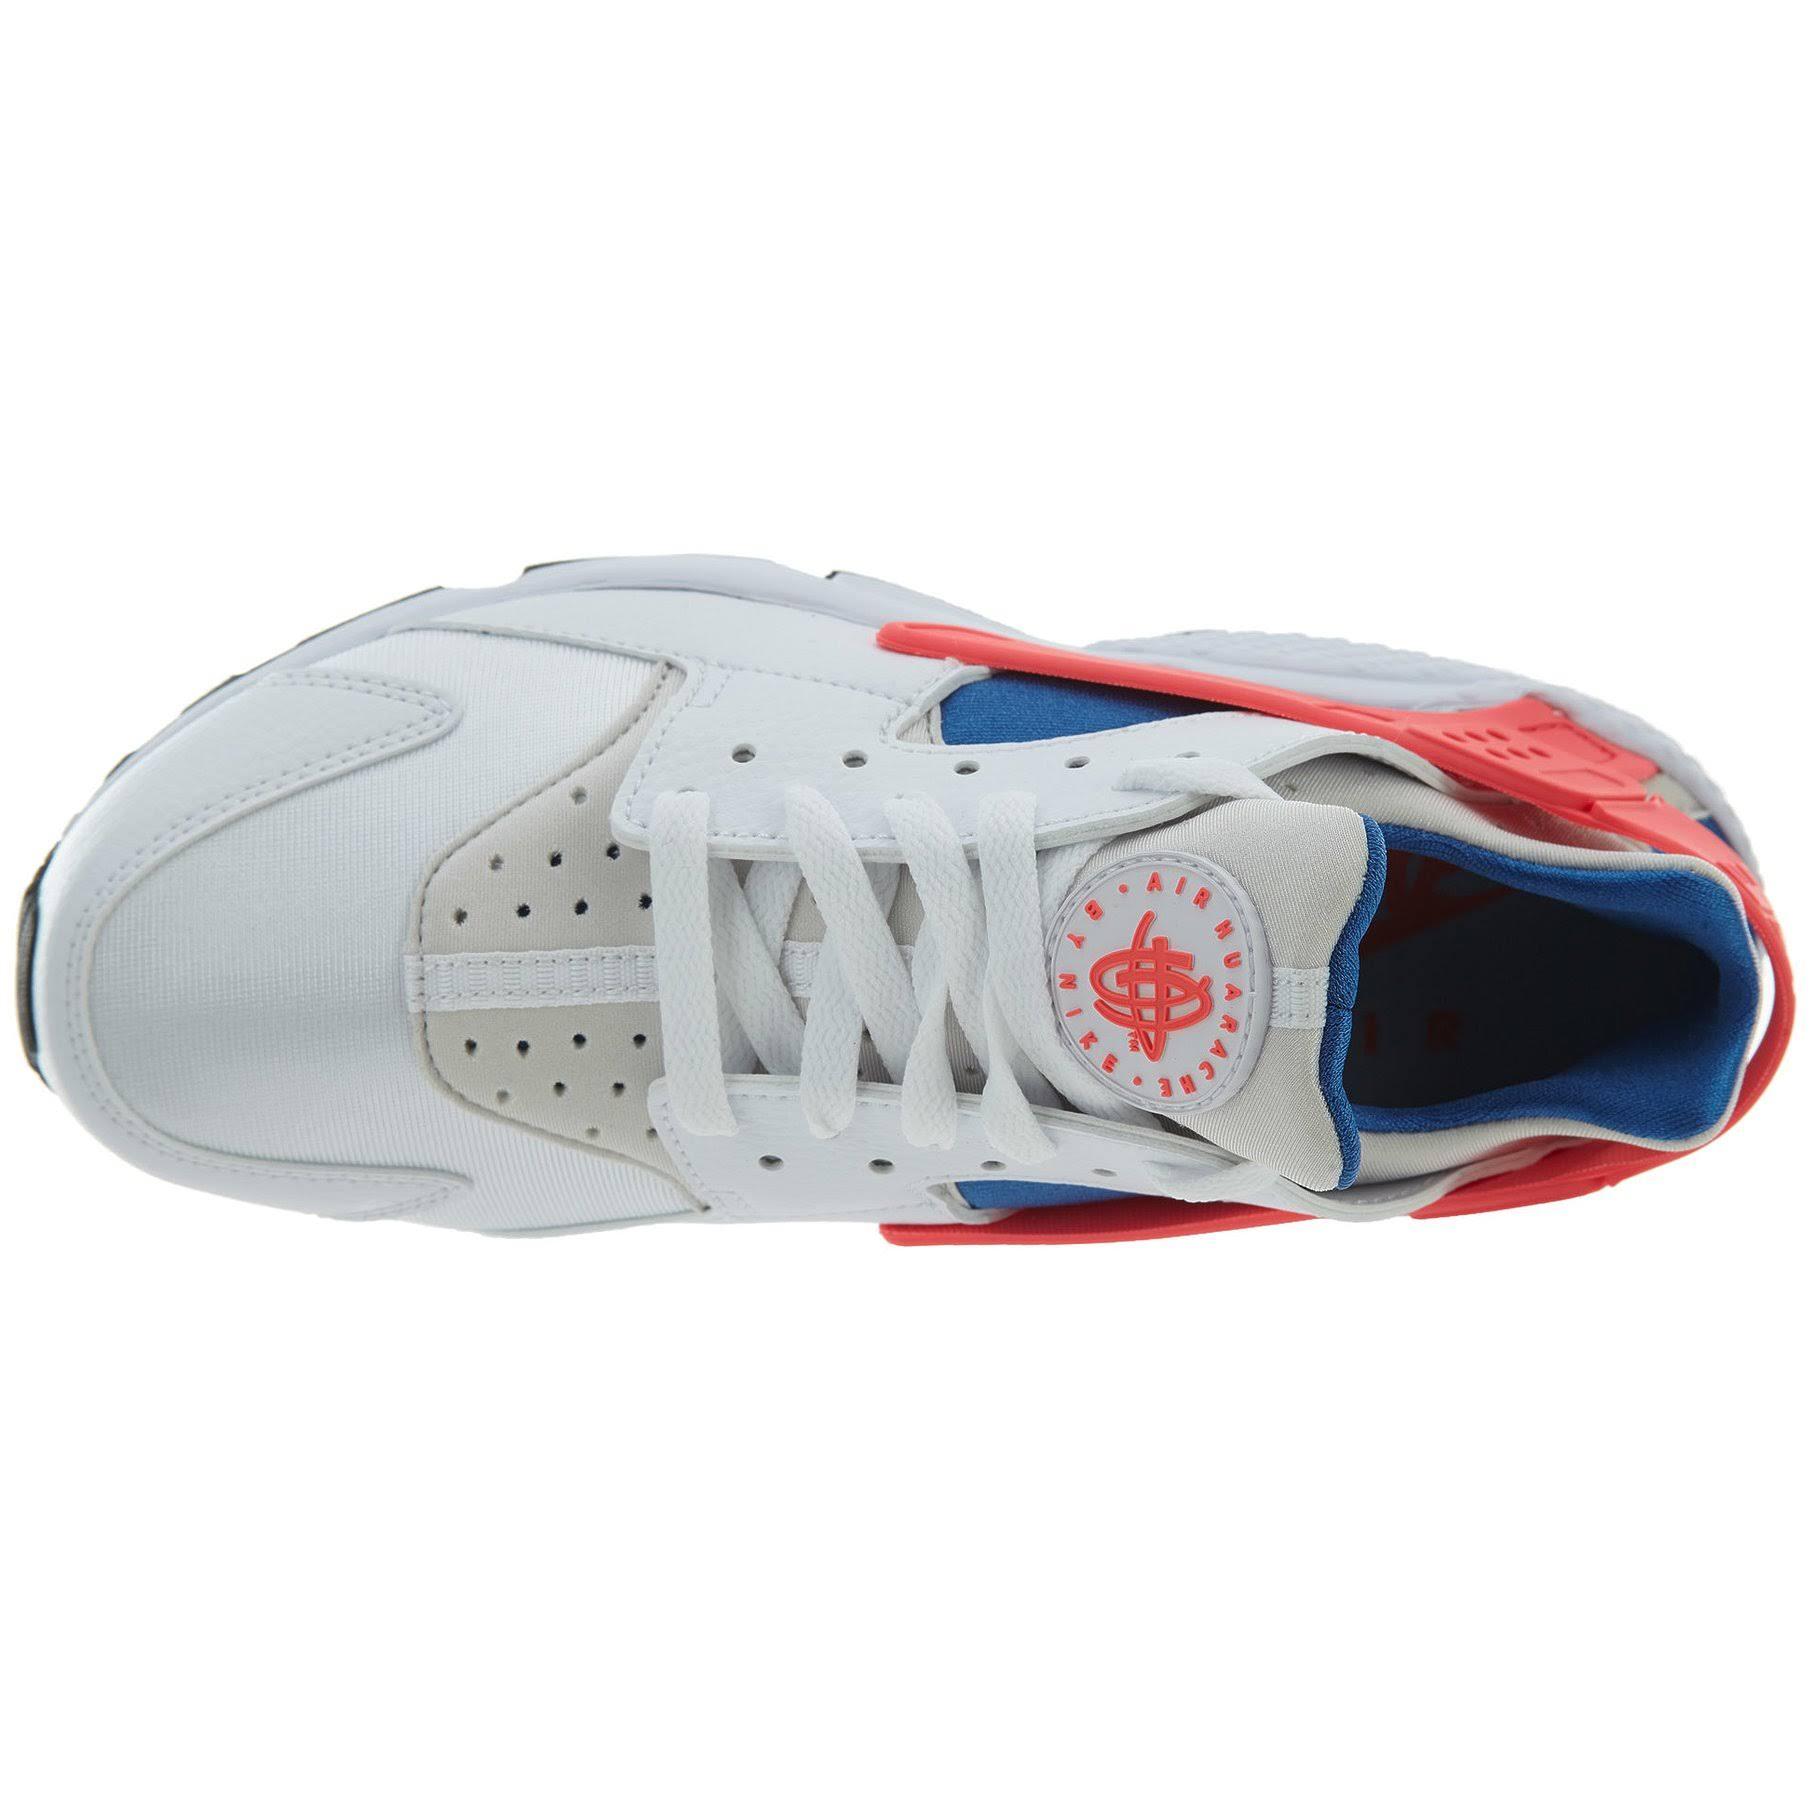 Ultramarin Huarache Größe Air 13 Nike Rot Weiß 318429112 Herrenschuhe Solar UAwpqqT0